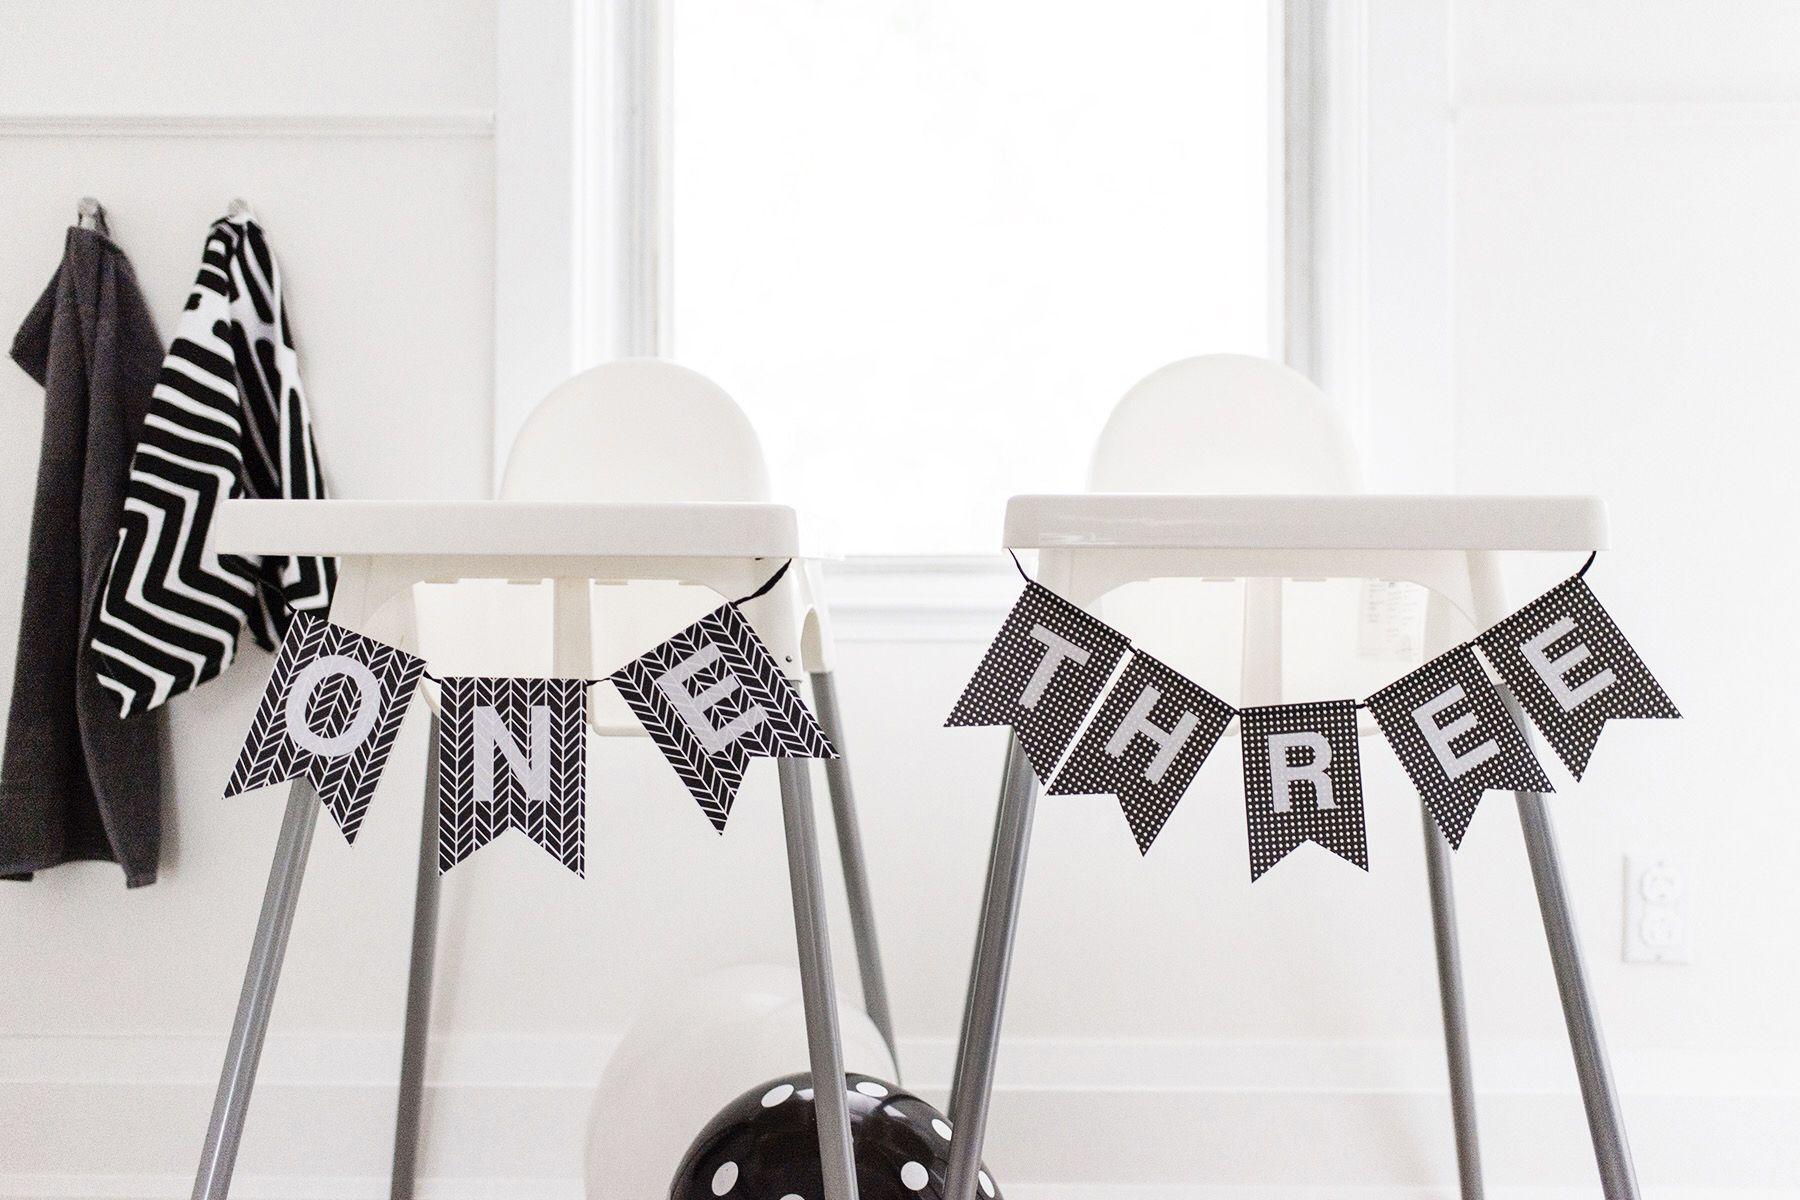 Kids birthday party high chair banner, black + white / monochrome ...